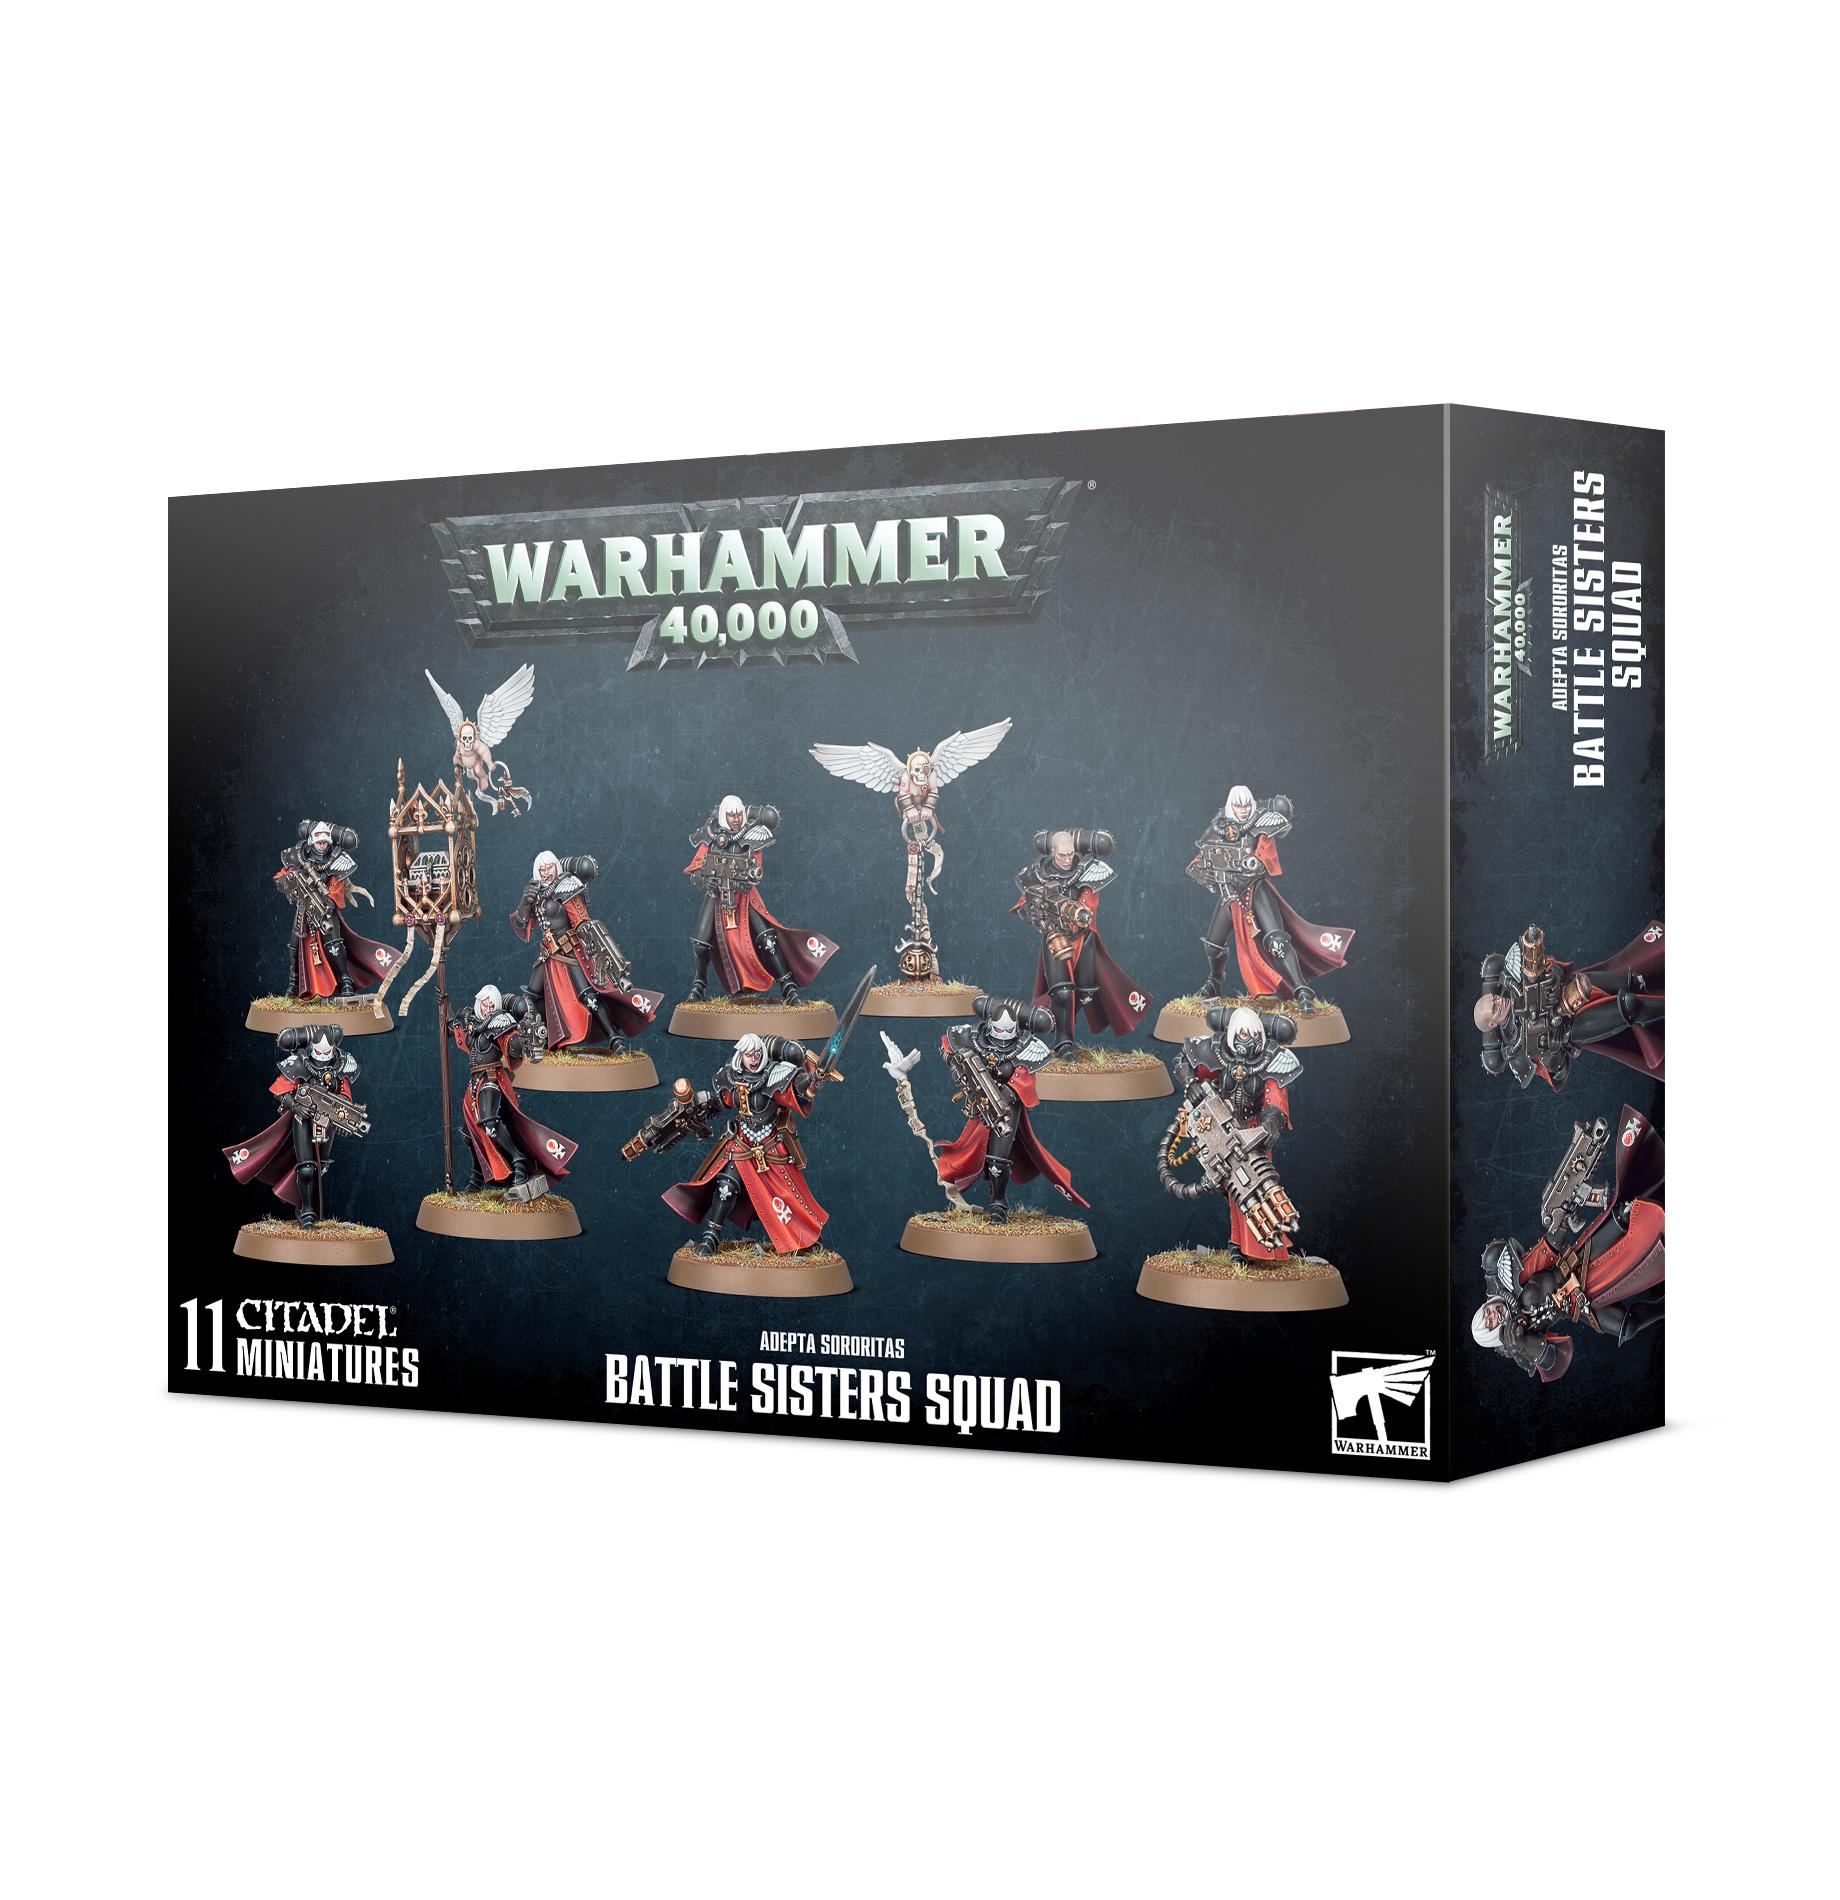 Warhammer 40k: Adepta Sororitas Battle Sisters Squad